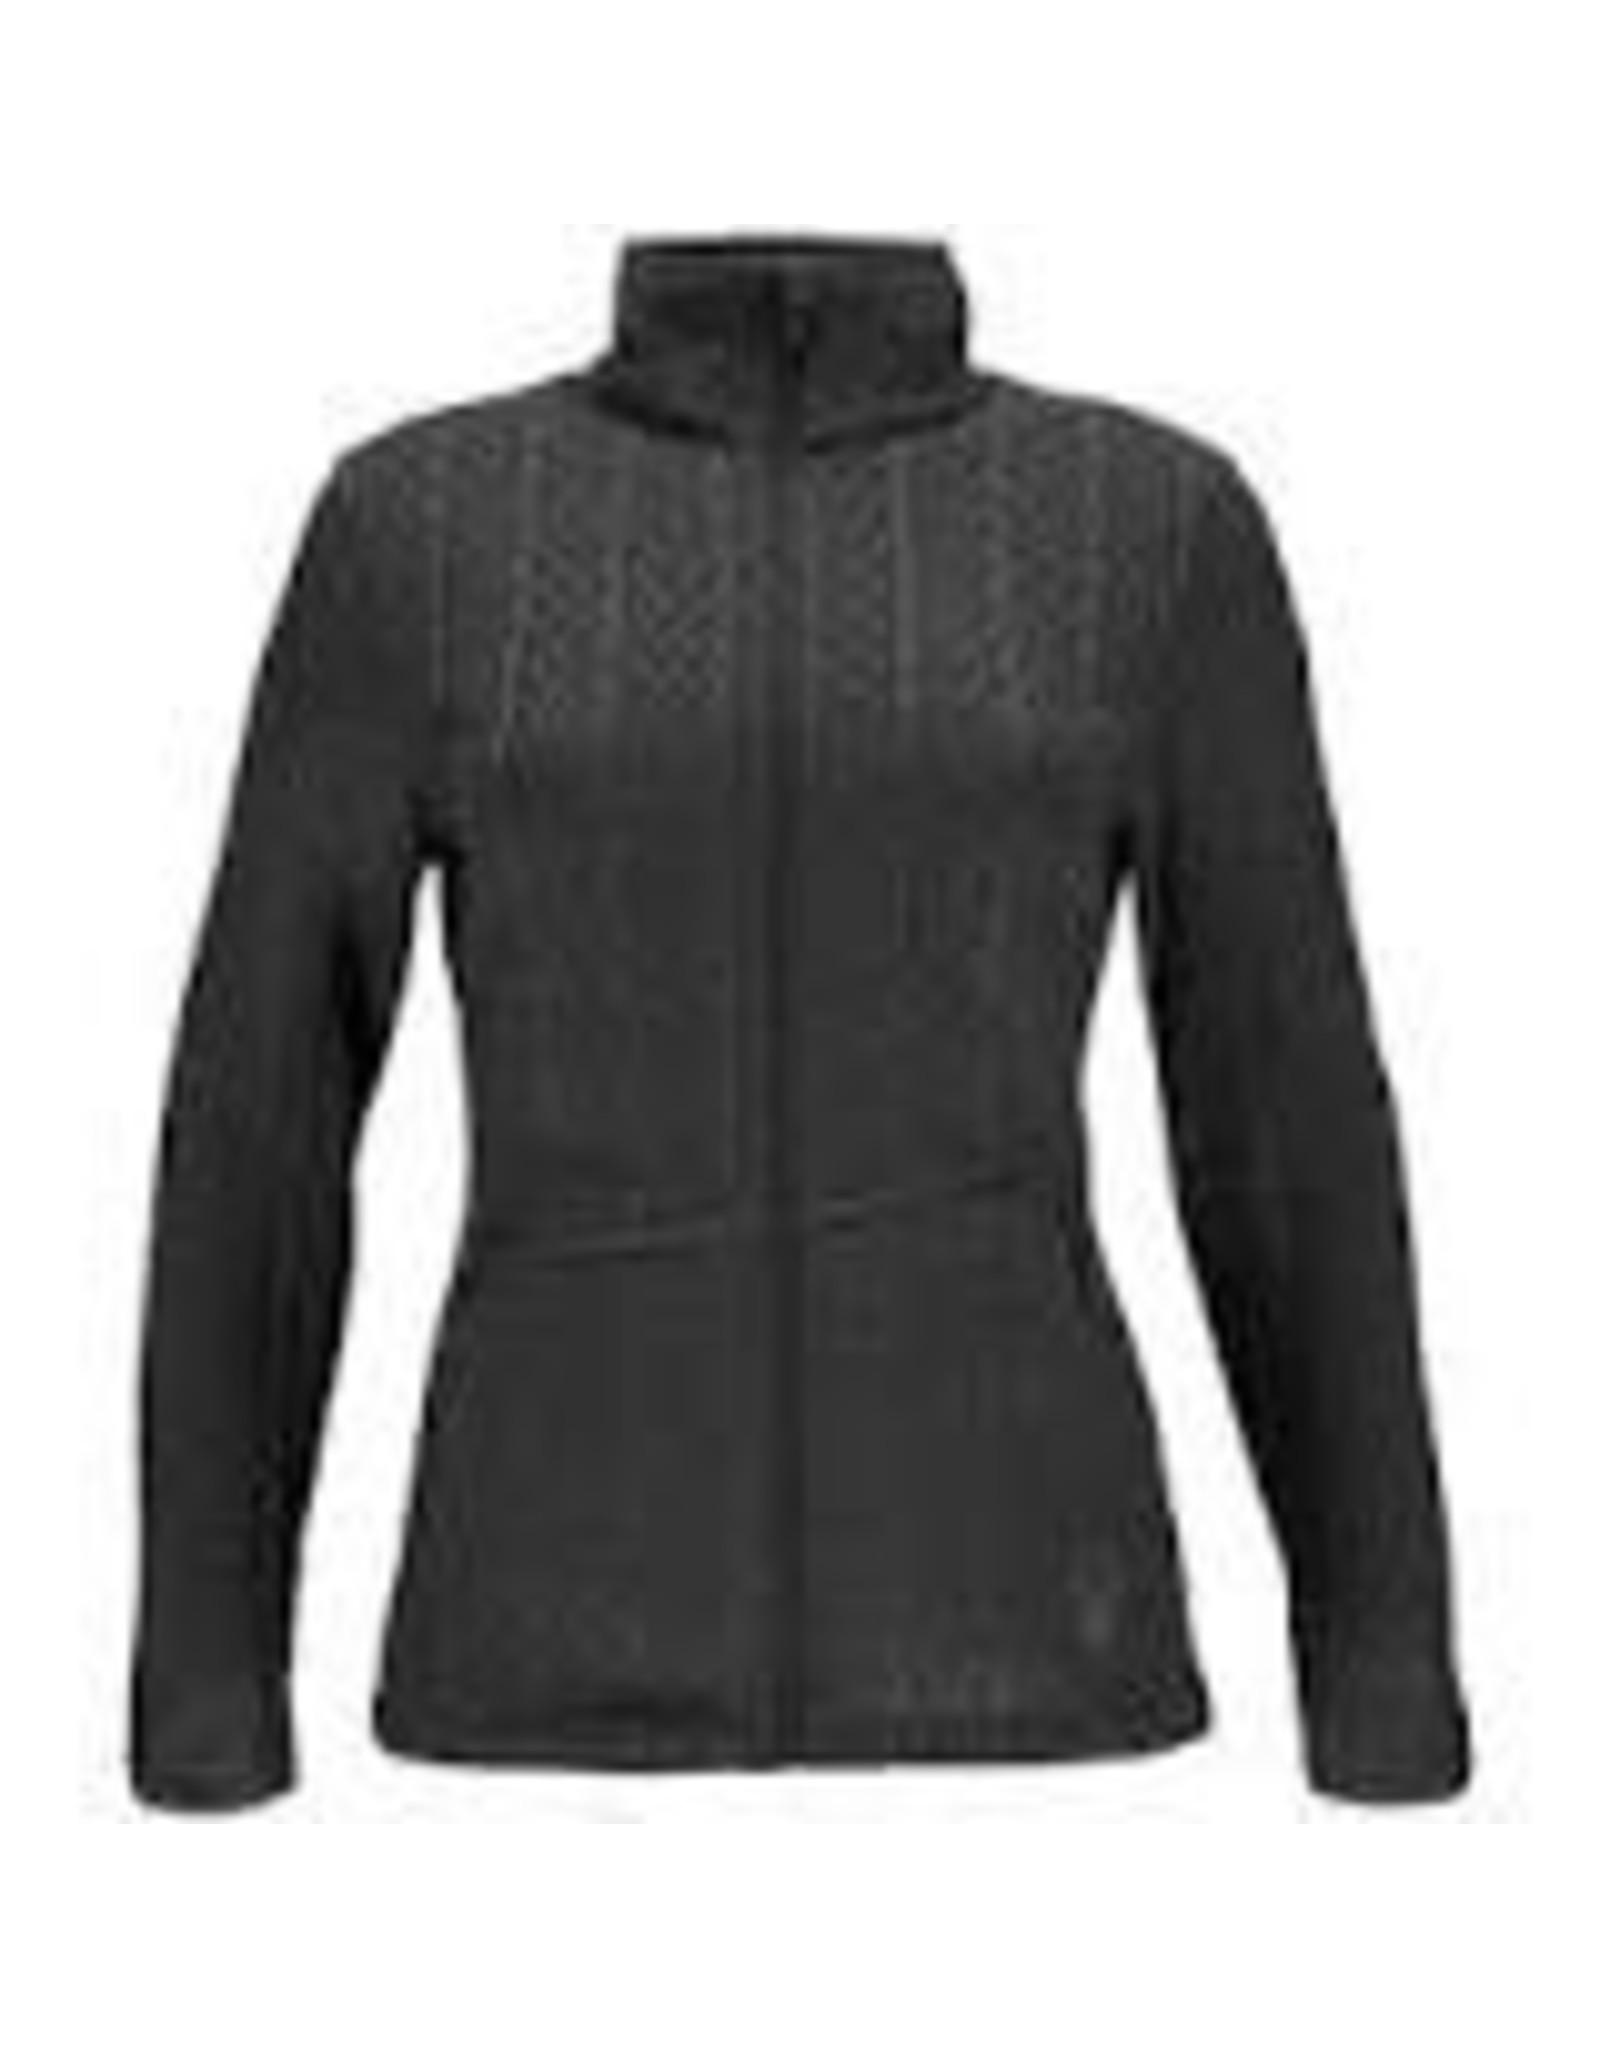 Spyder Spyder Major Cable Core Sweater Women's Full Zip